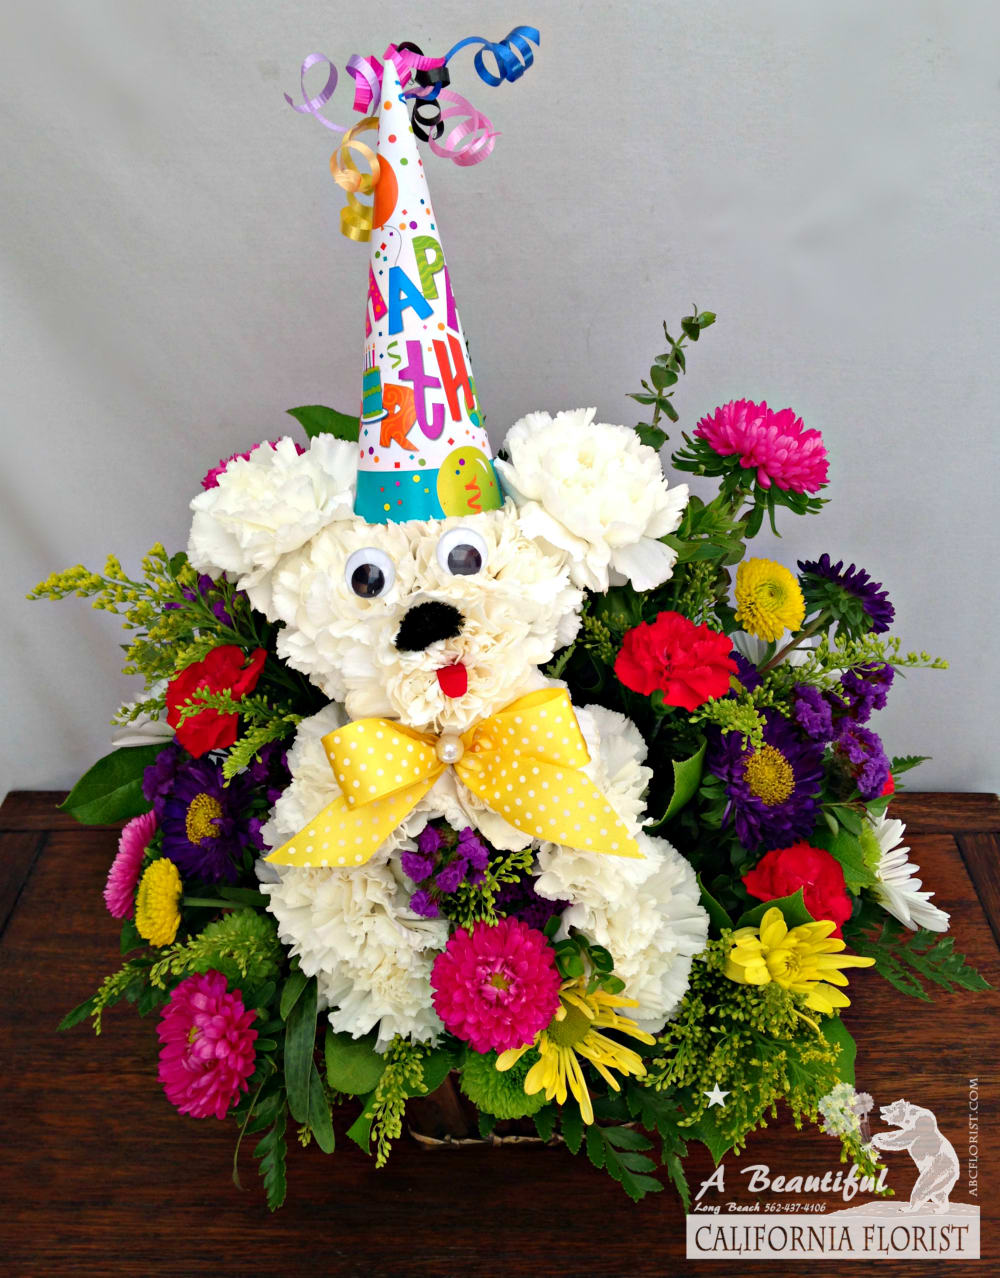 Woof Woof Happy Birthday Birthday Flower Arrangements From Abc Florist Long Beach By A Beautiful California Florist